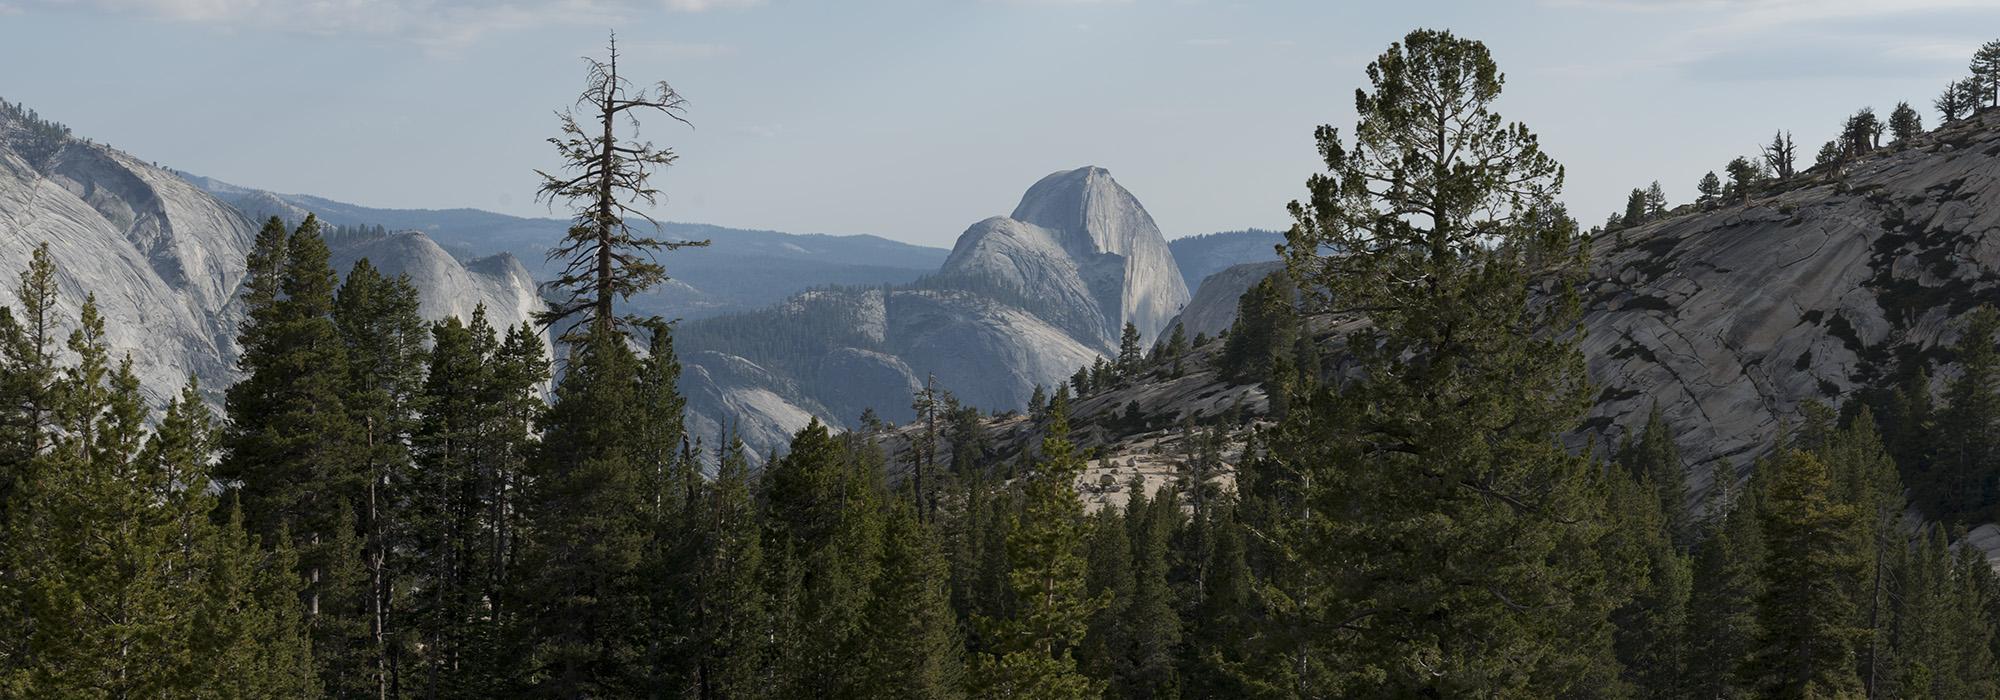 YosemiteNationalPark_hero_CarolMHighsmith.jpg